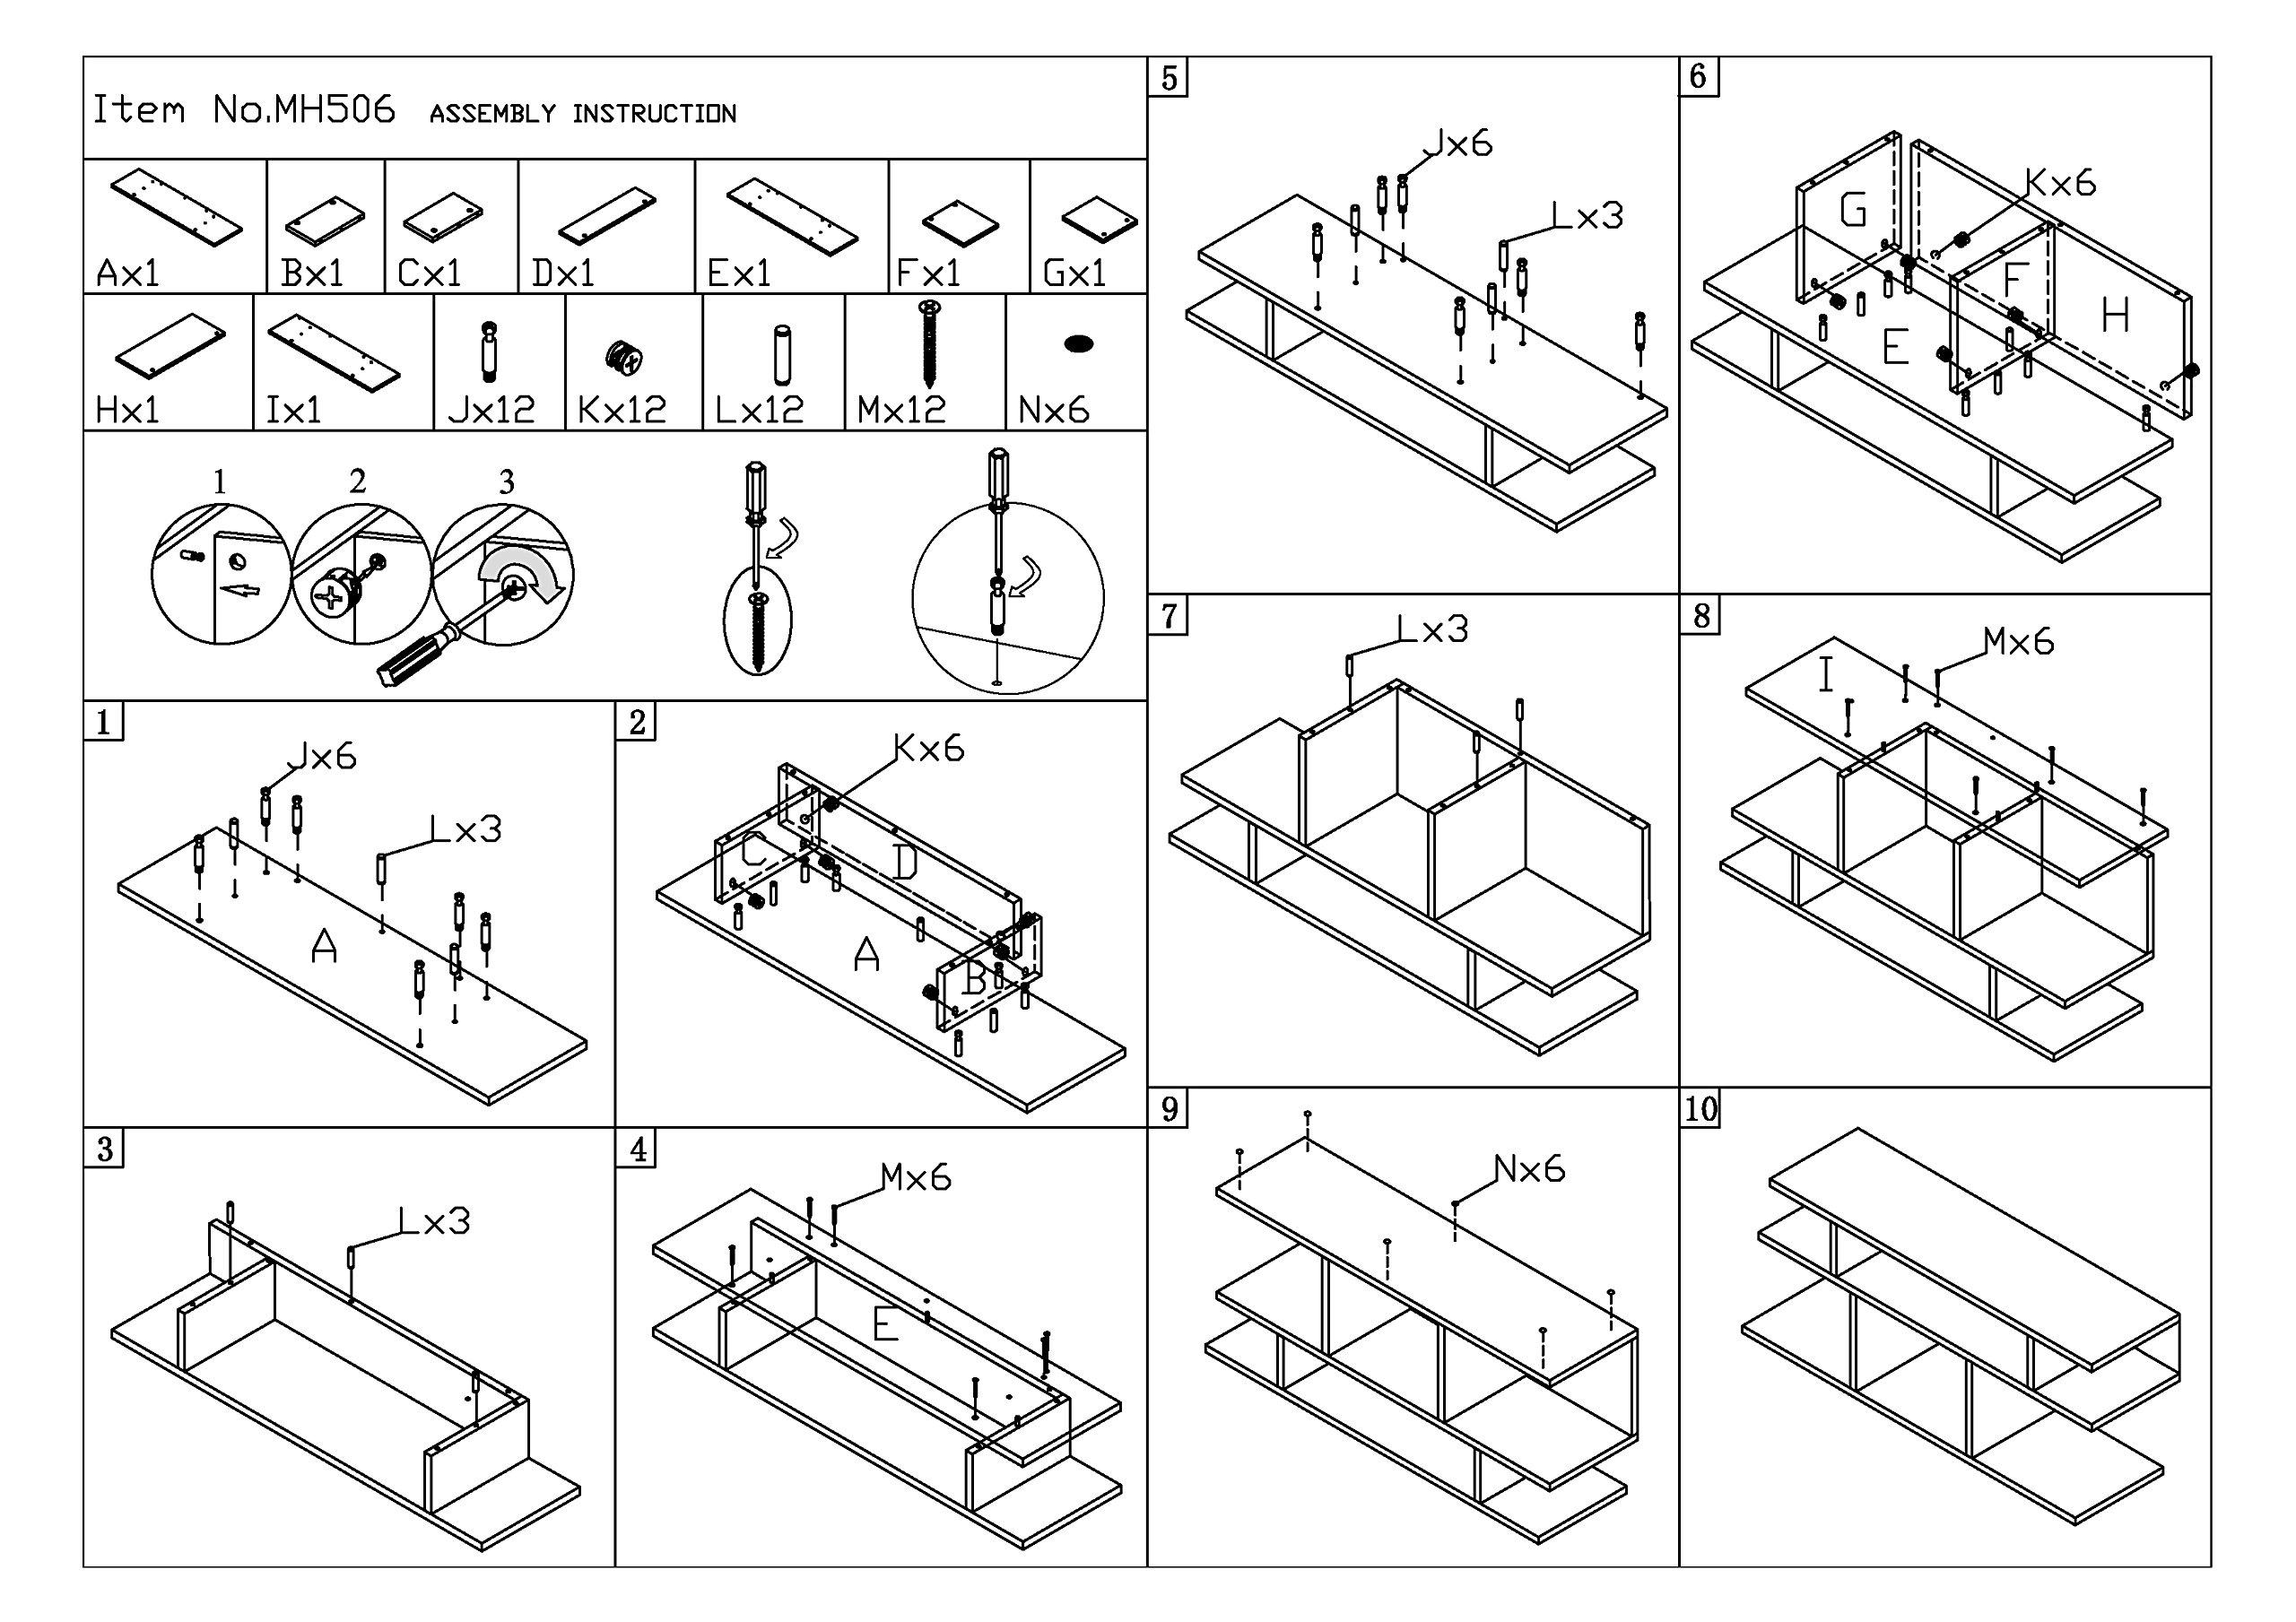 Frenchi Home Furnishing Wood/Console Sofa Table, Black by Frenchi Home Furnishing (Image #2)